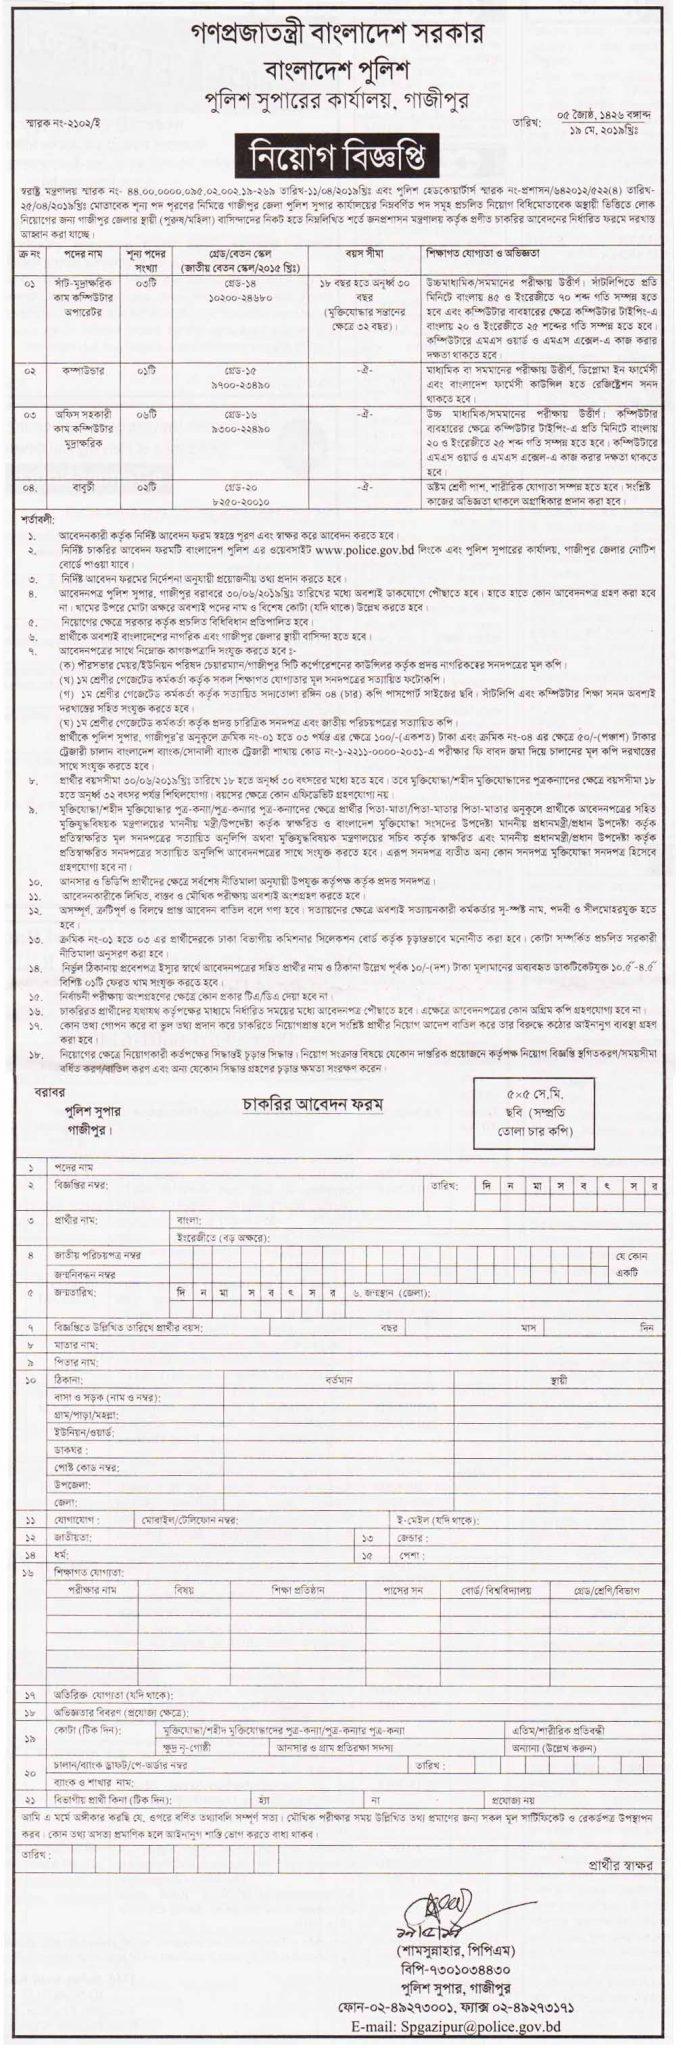 Bangladesh Police Super Office Job Circular 2019